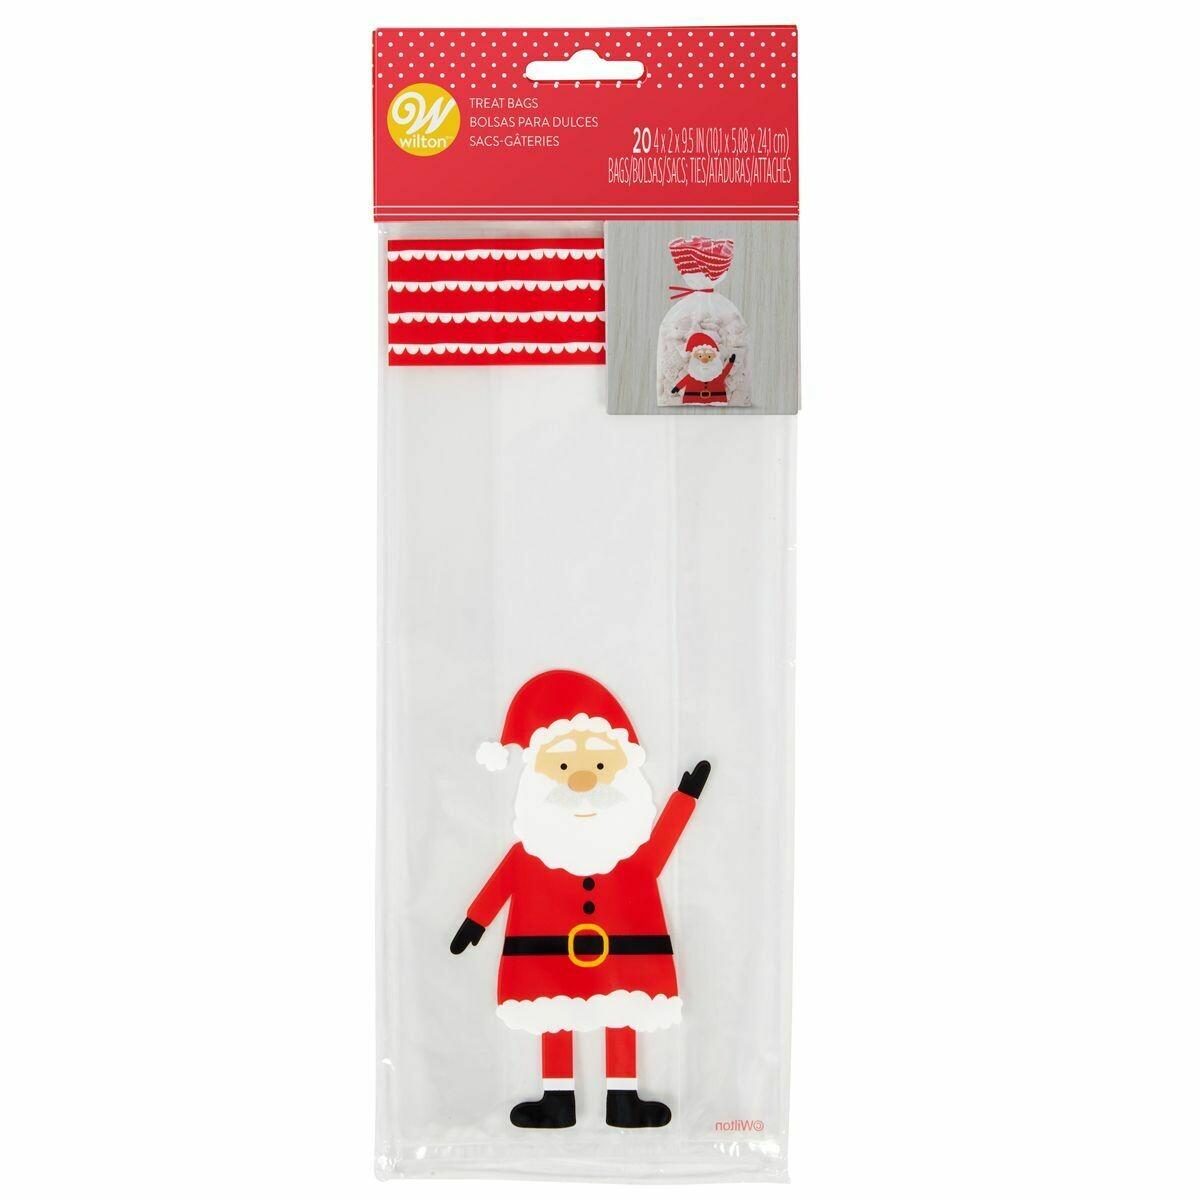 Wilton Christmas Treat Bags -SANTA CLAUS -Pack of 20